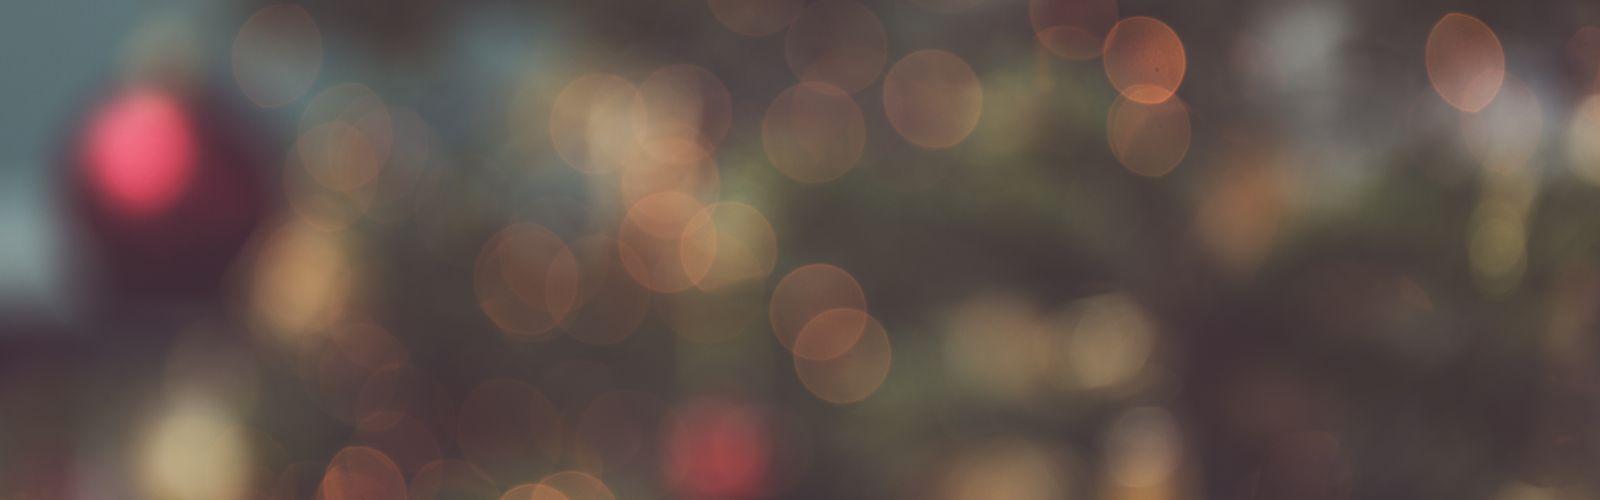 Blurred Christmas lights on evergreen tree